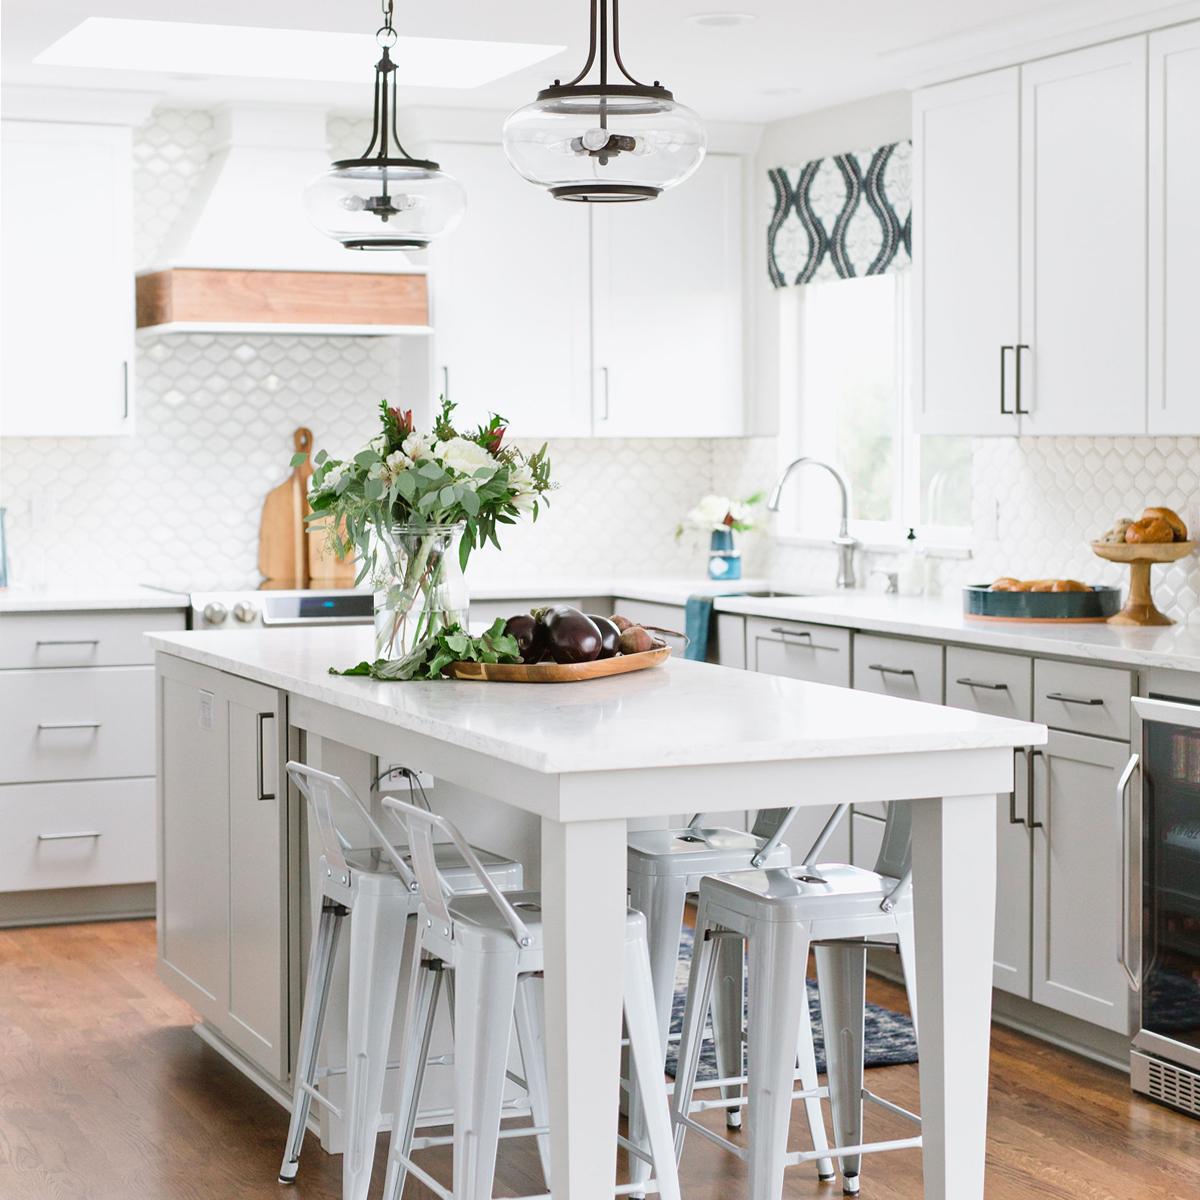 Five Corners Kitchen Renovation